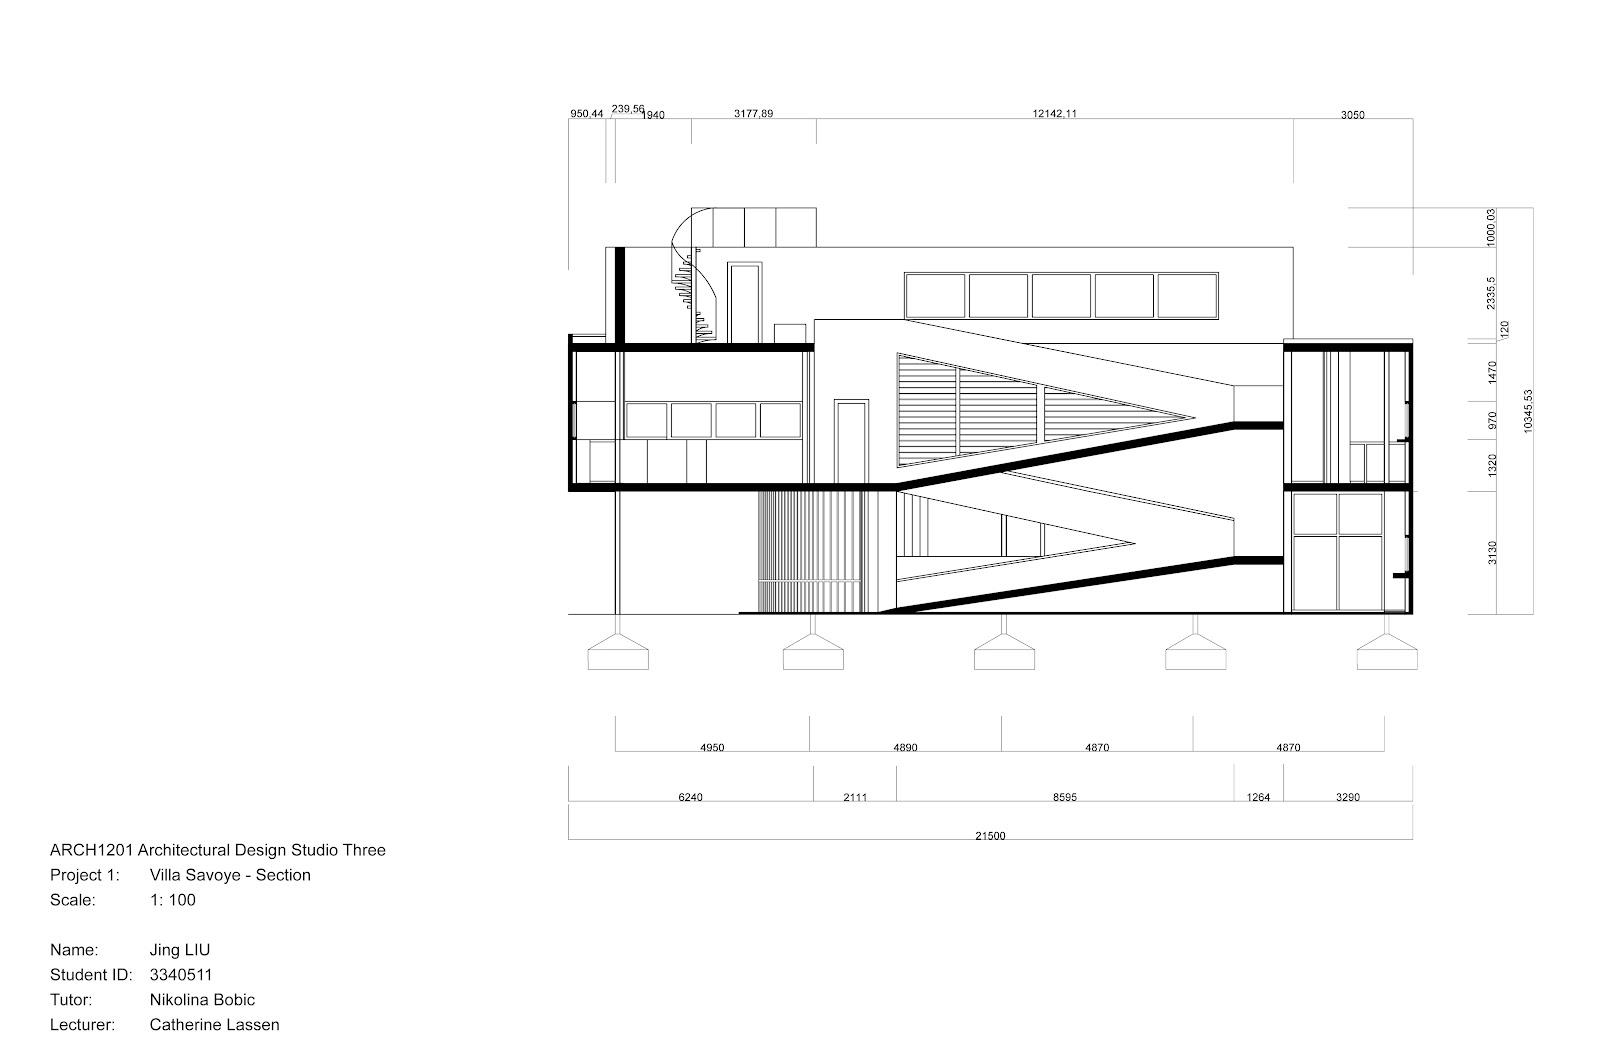 Villa Savoye Elevation Project one - drawingsVilla Savoye Section